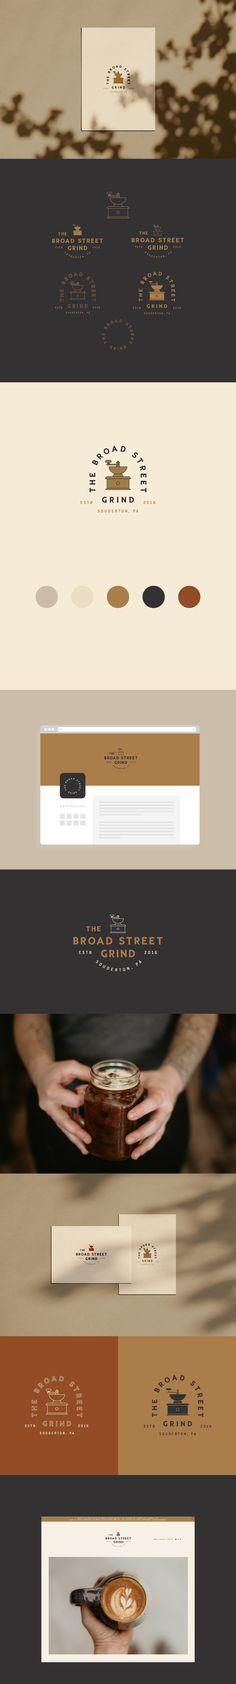 The Broad Street Grind Brand Identity Design Corporate Design, Brand Identity Design, Brand Design, Ci Design, Graphic Design, Coffee Shop Branding, Inspiration Logo Design, Best Coffee Shop, Shops